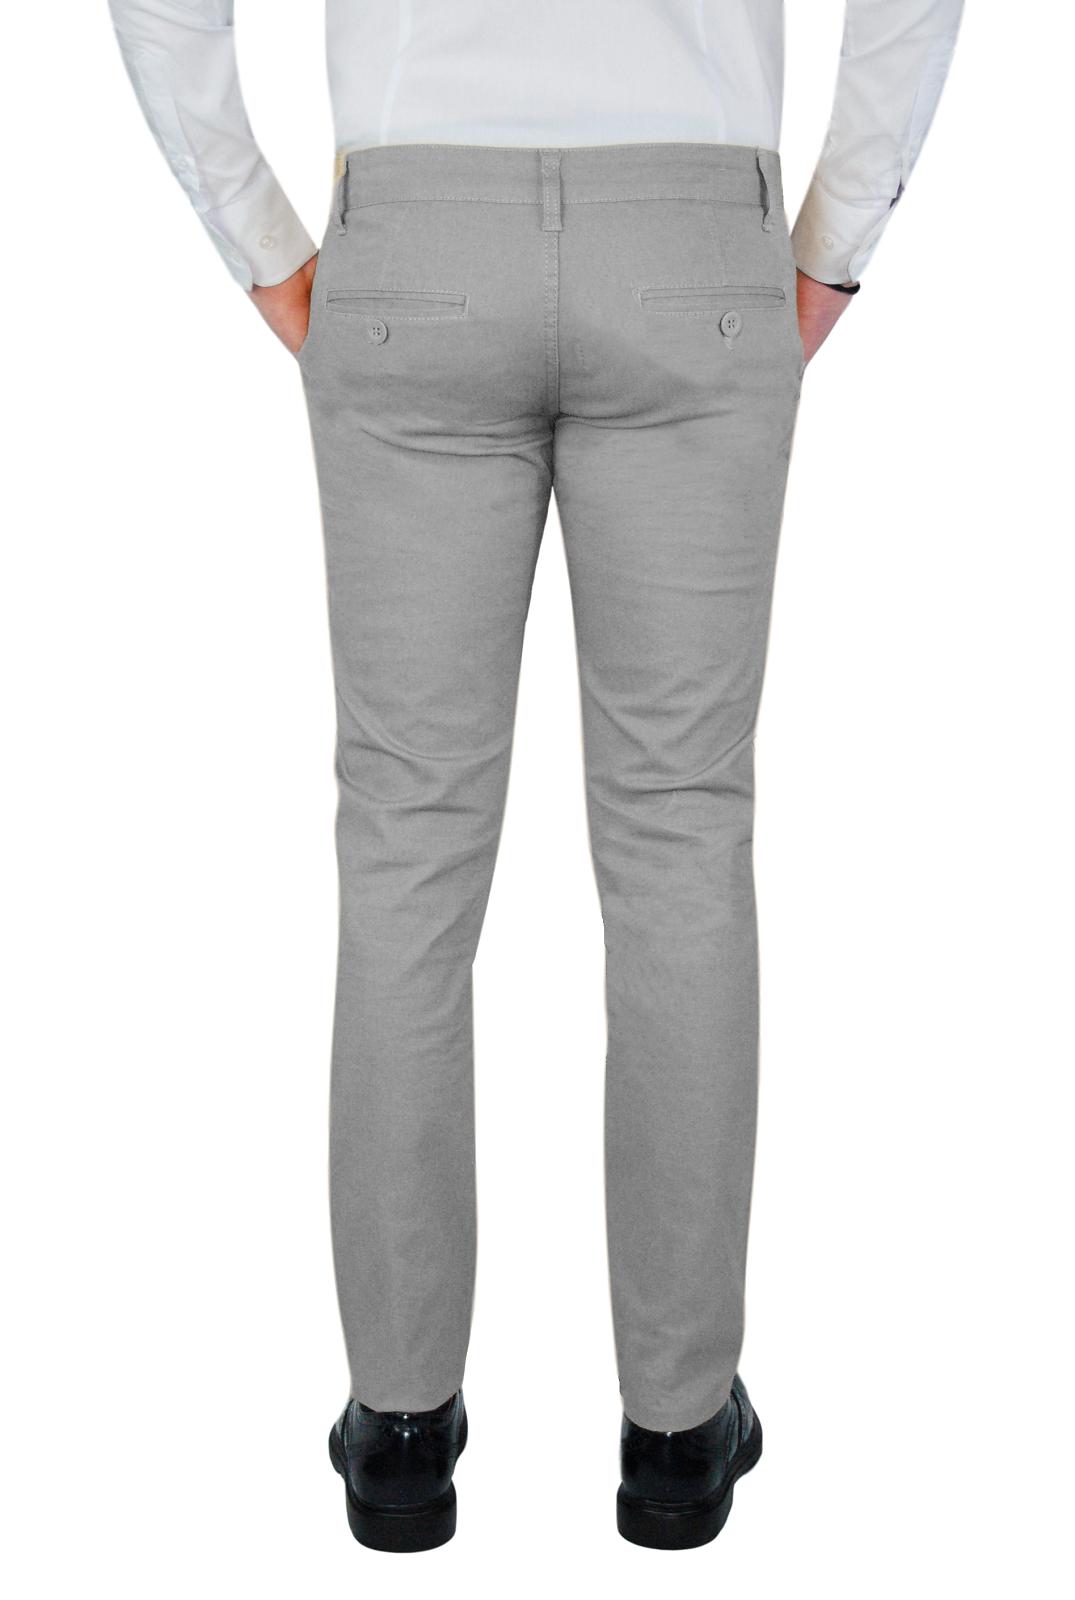 Pantalone-Uomo-Chino-Invernale-slim-fit-Pantaloni-Eleganti-Blu-Verde-Nero miniatura 35